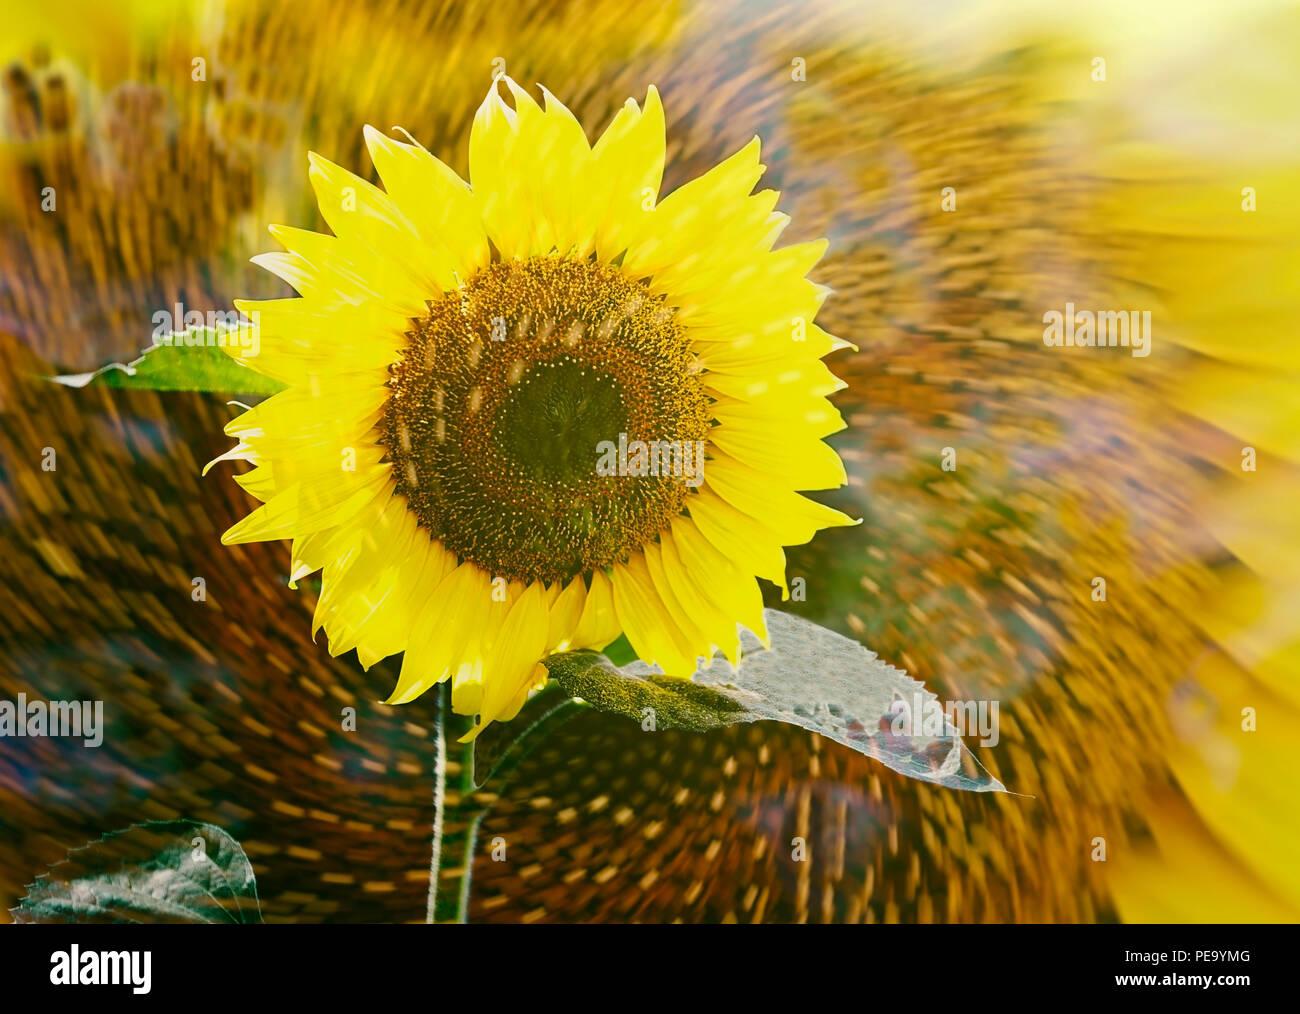 sunflower spinning Stock Photo